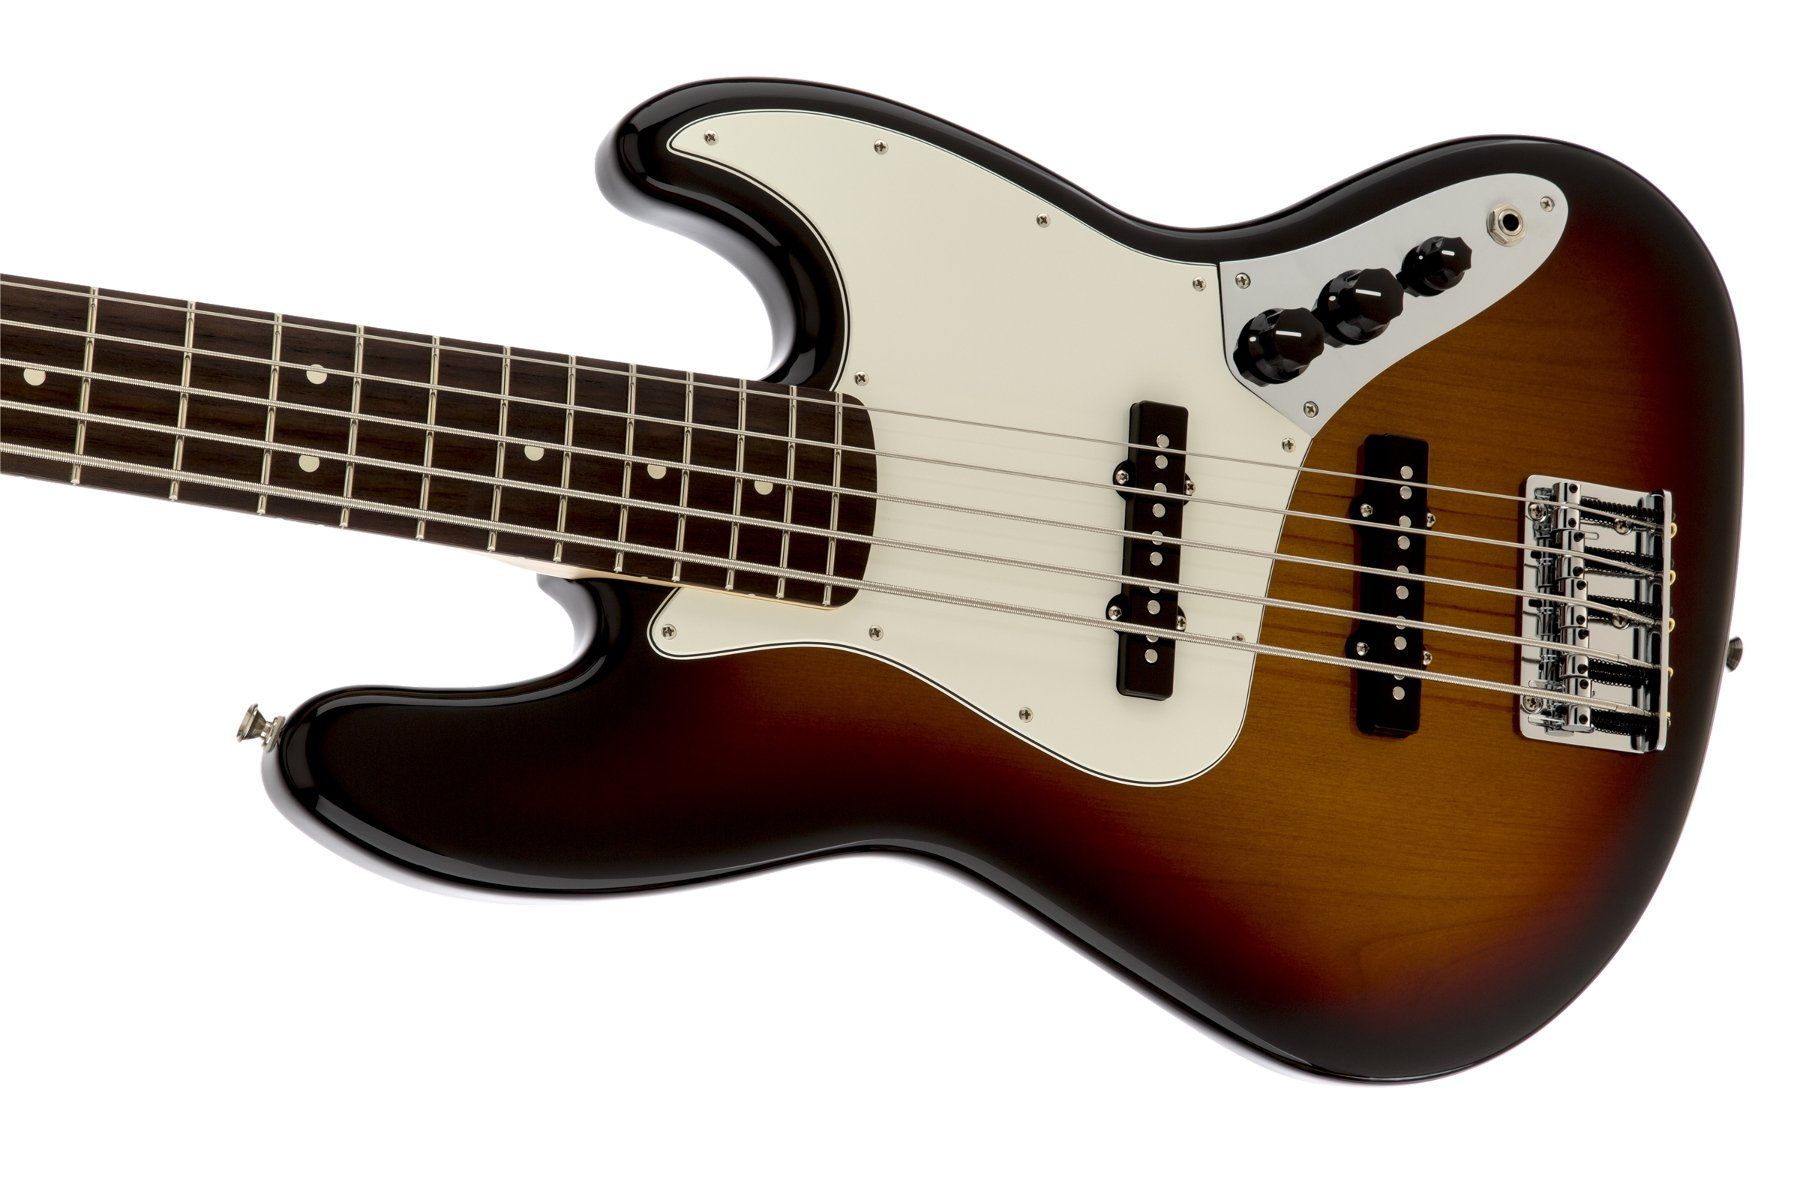 5-String Bass with Brown Sunburst Finish